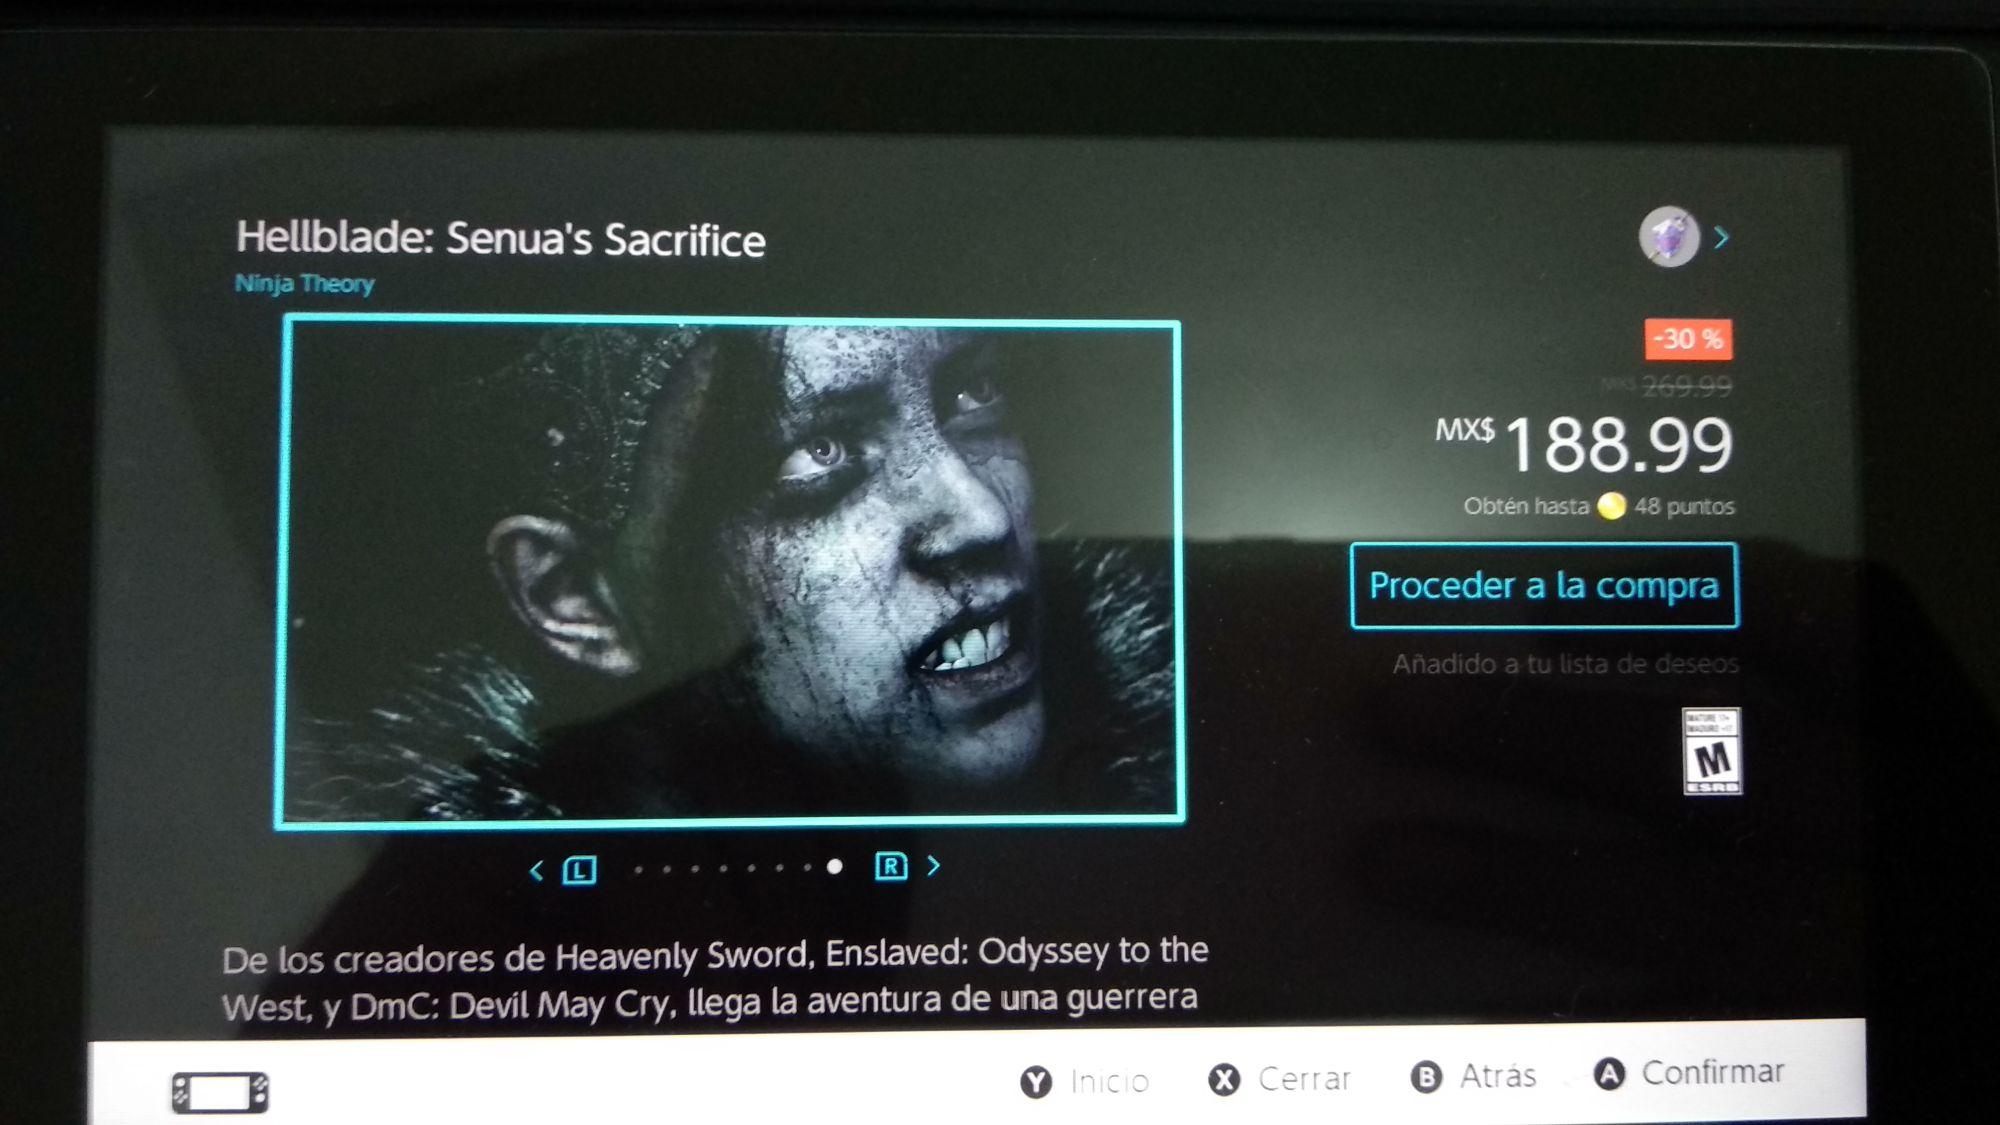 Nintendo eShop: Hellblade Senua's Sacrifice